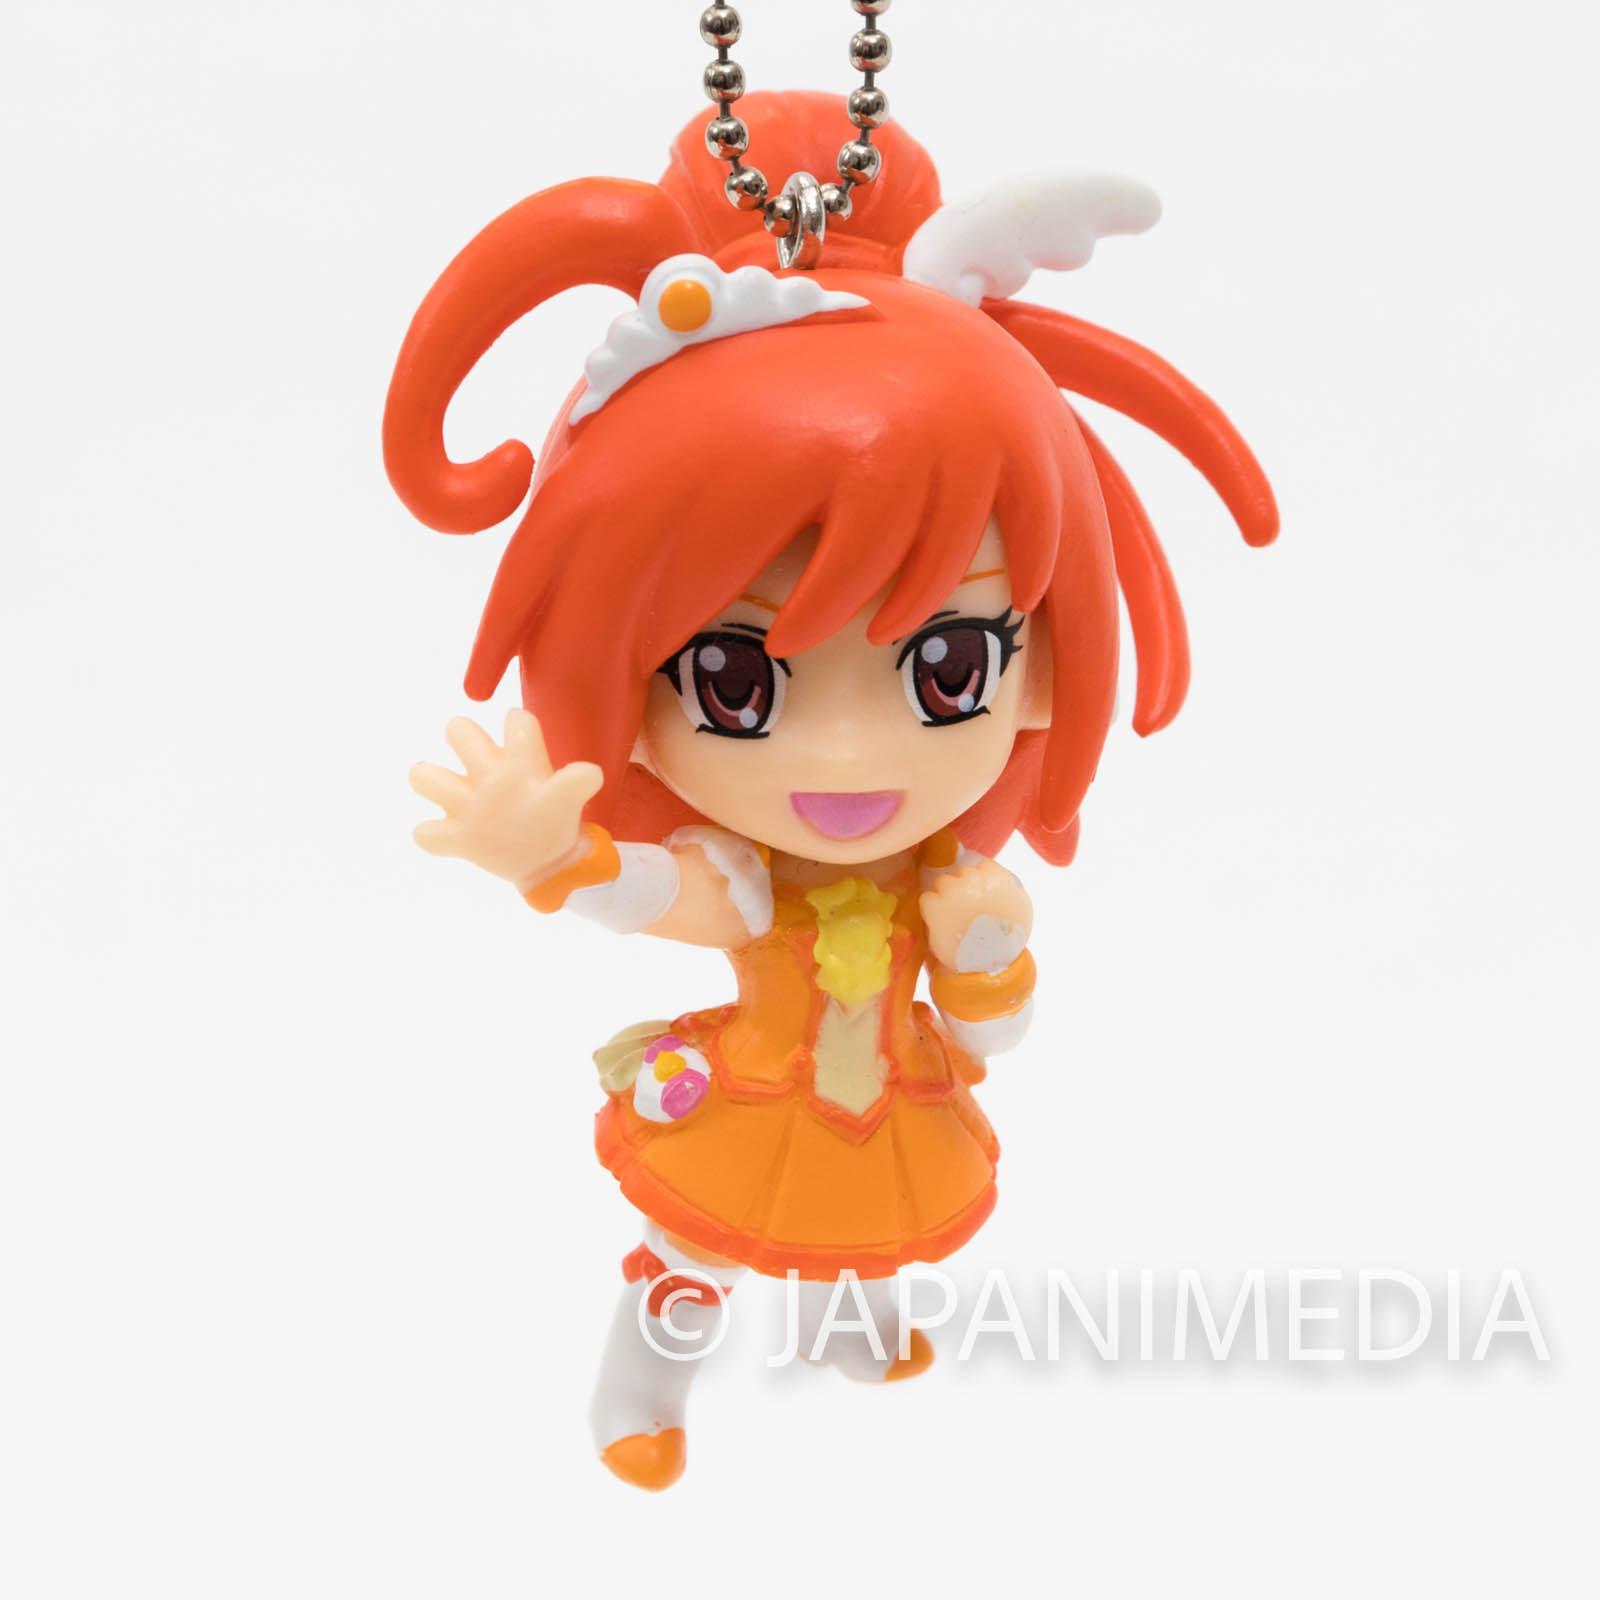 Smile PreCure! Cure Sunny PreCure Mascot Figure Ball Keychain JAPAN ANIME